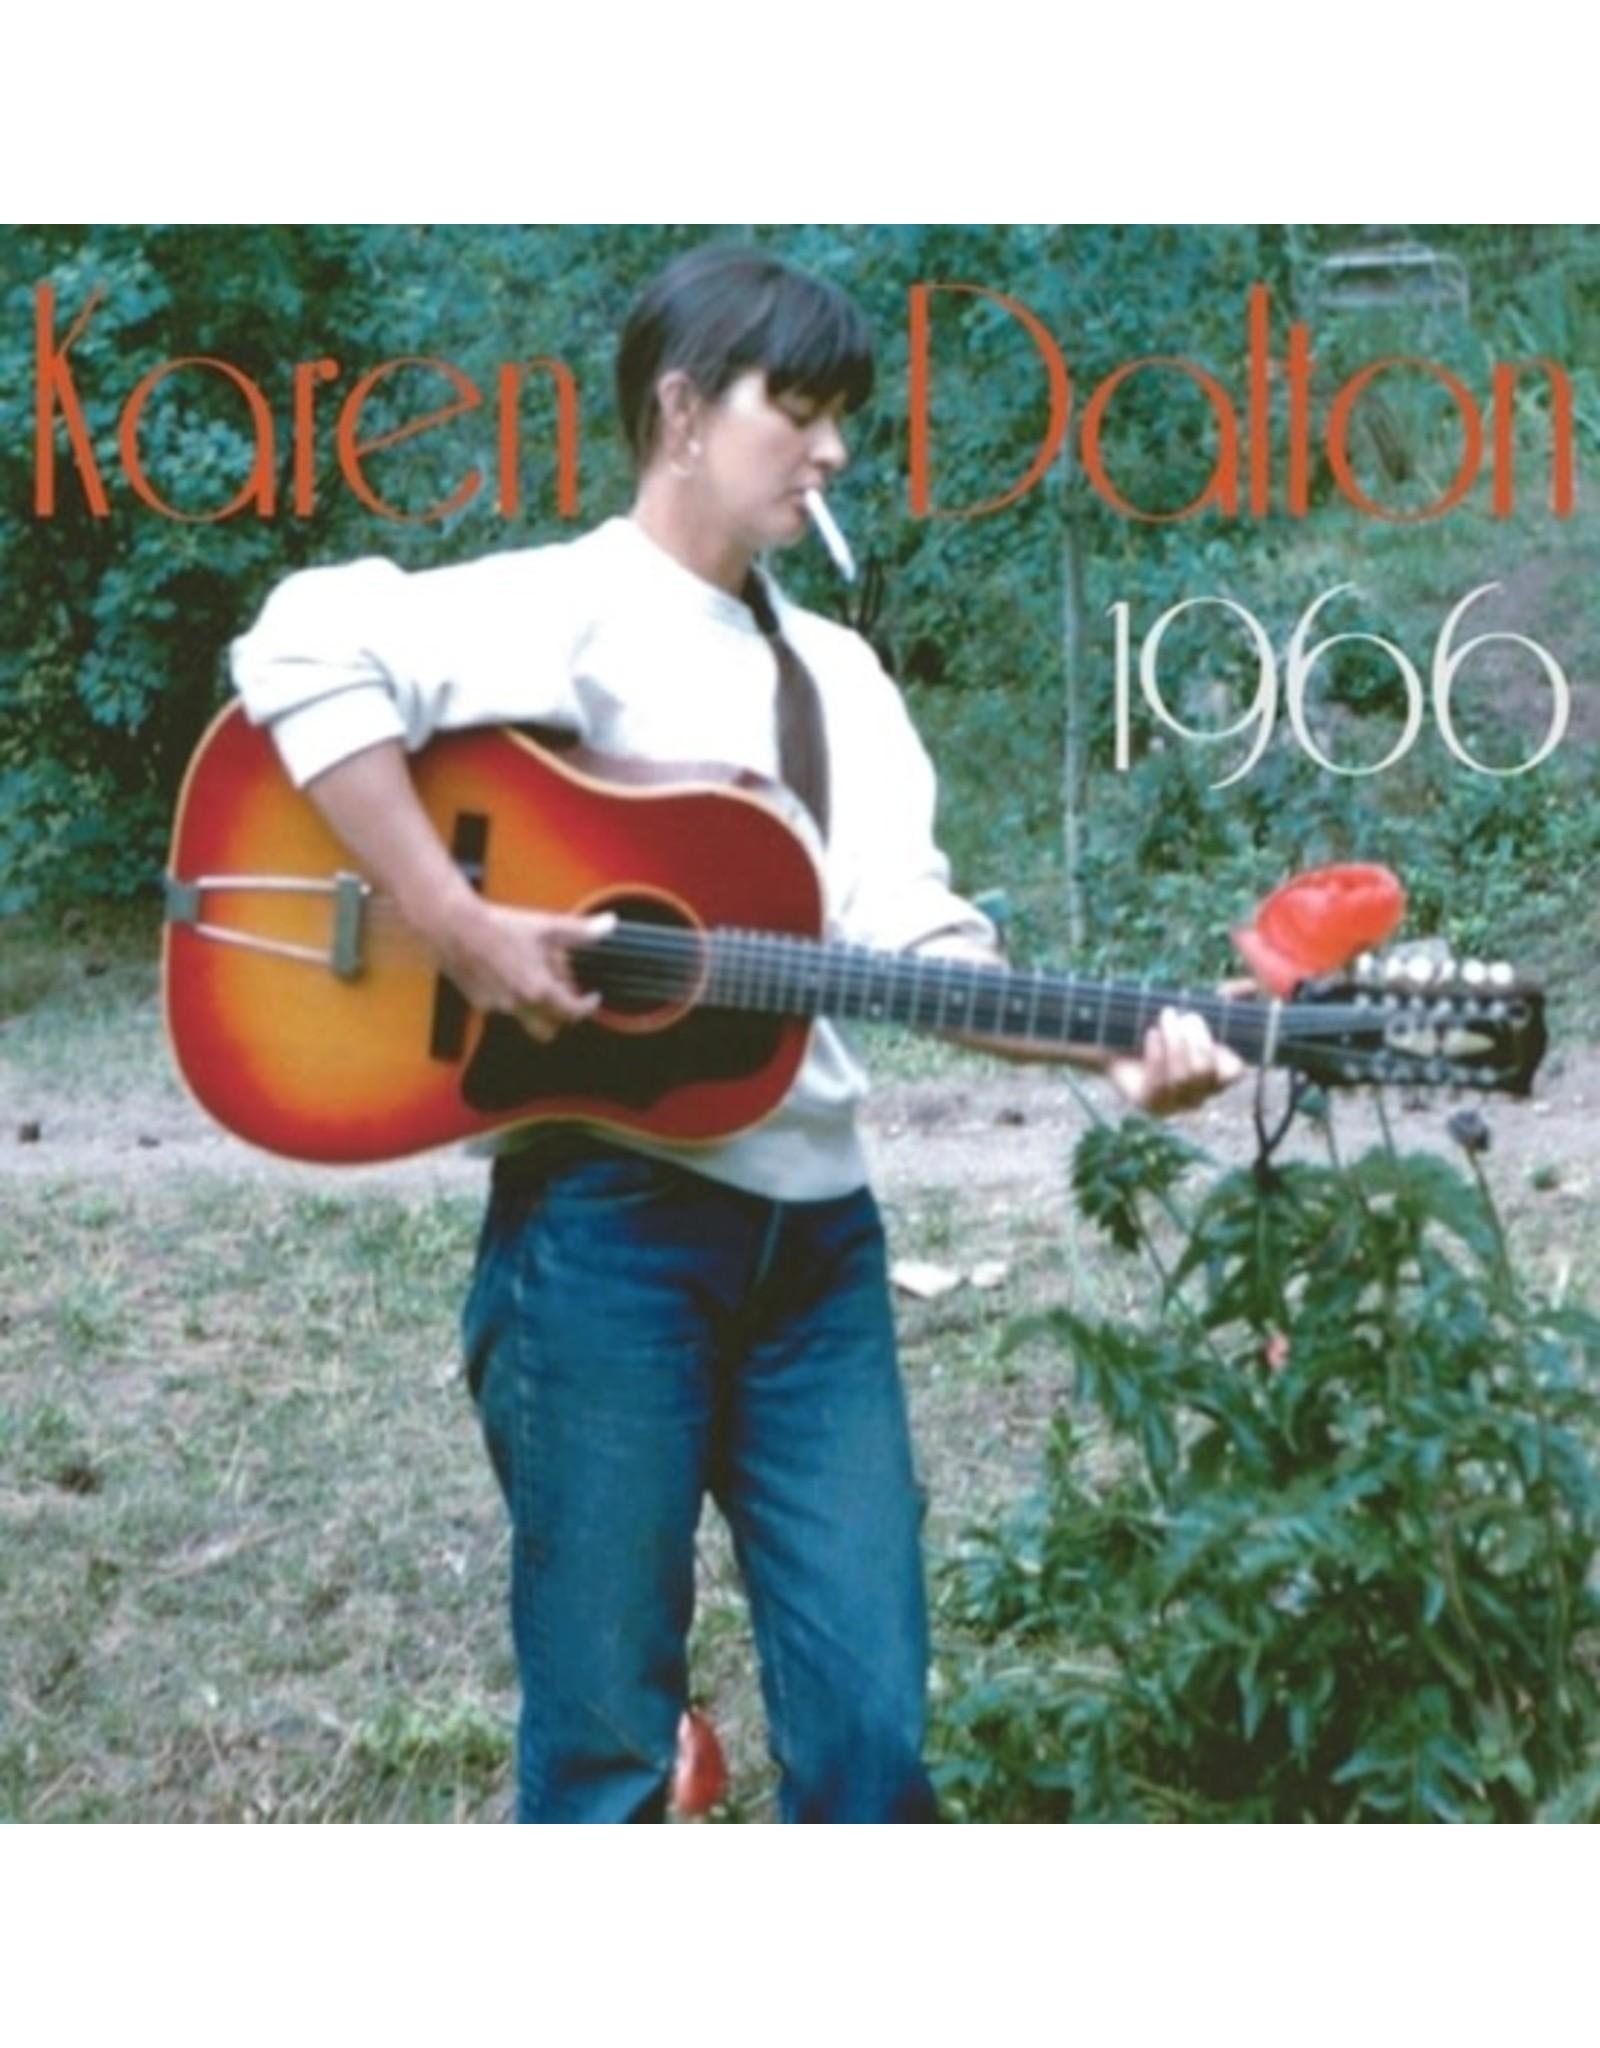 Delmore Dalton, Karen: 1966 LP